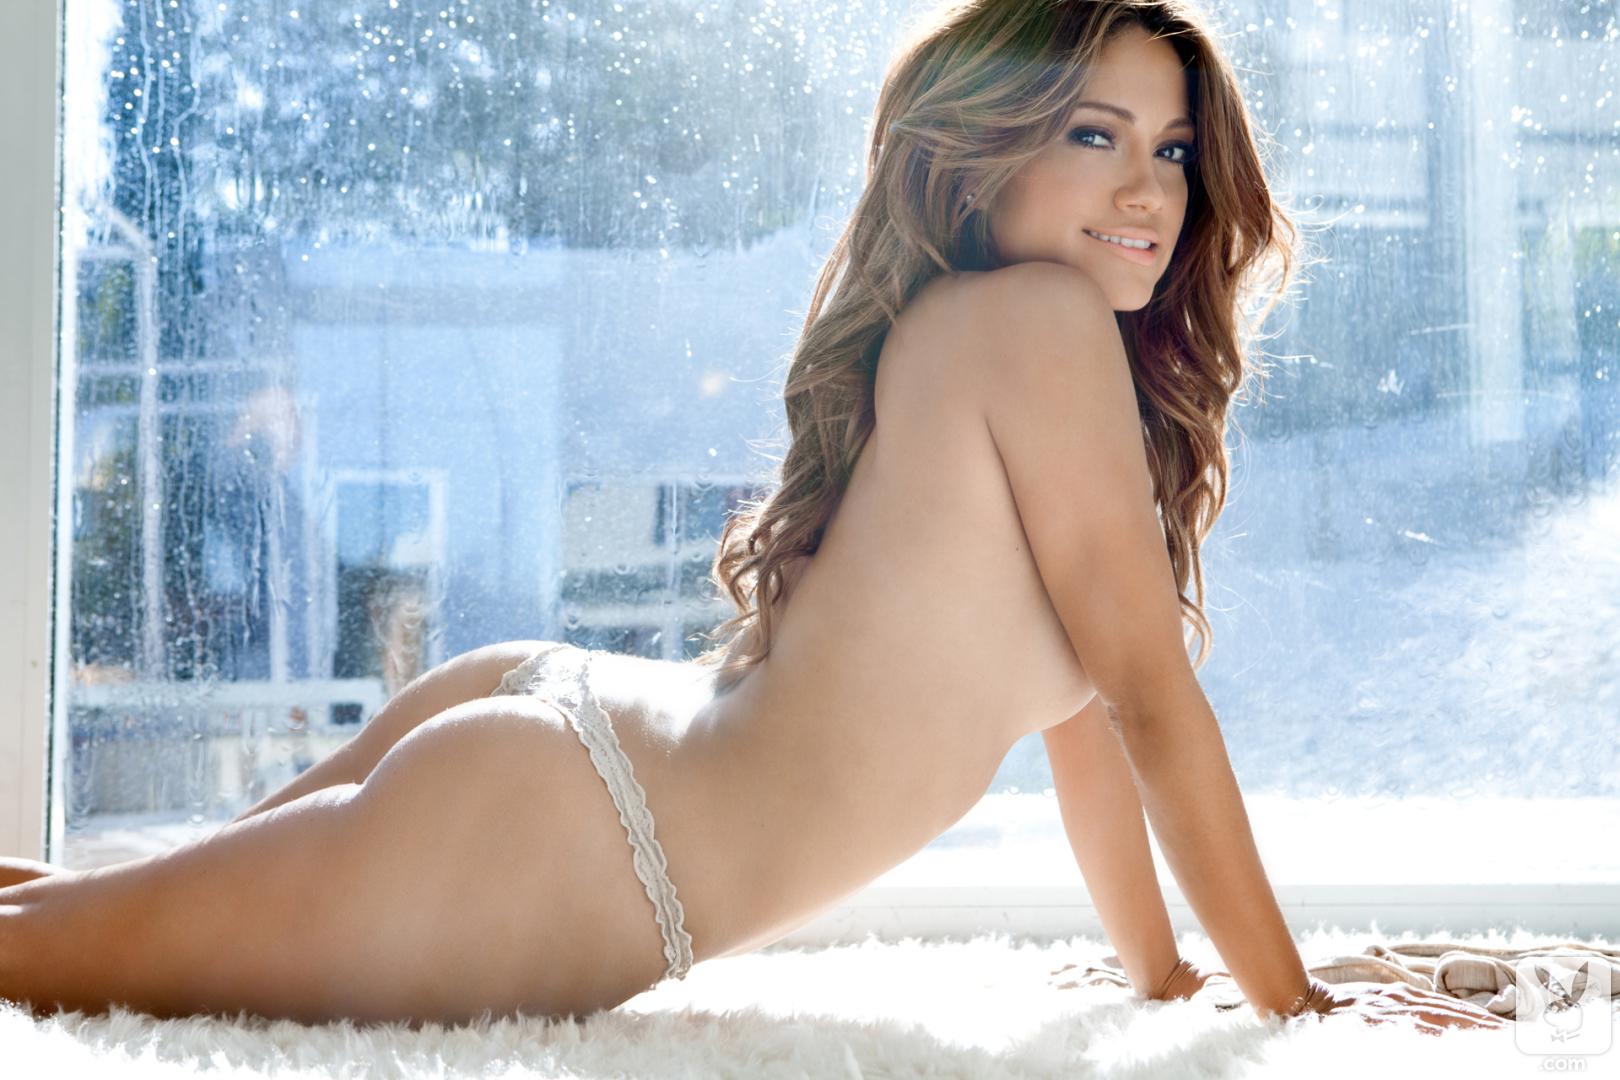 Jessica lopes nude leaked photos nude celebrity photos